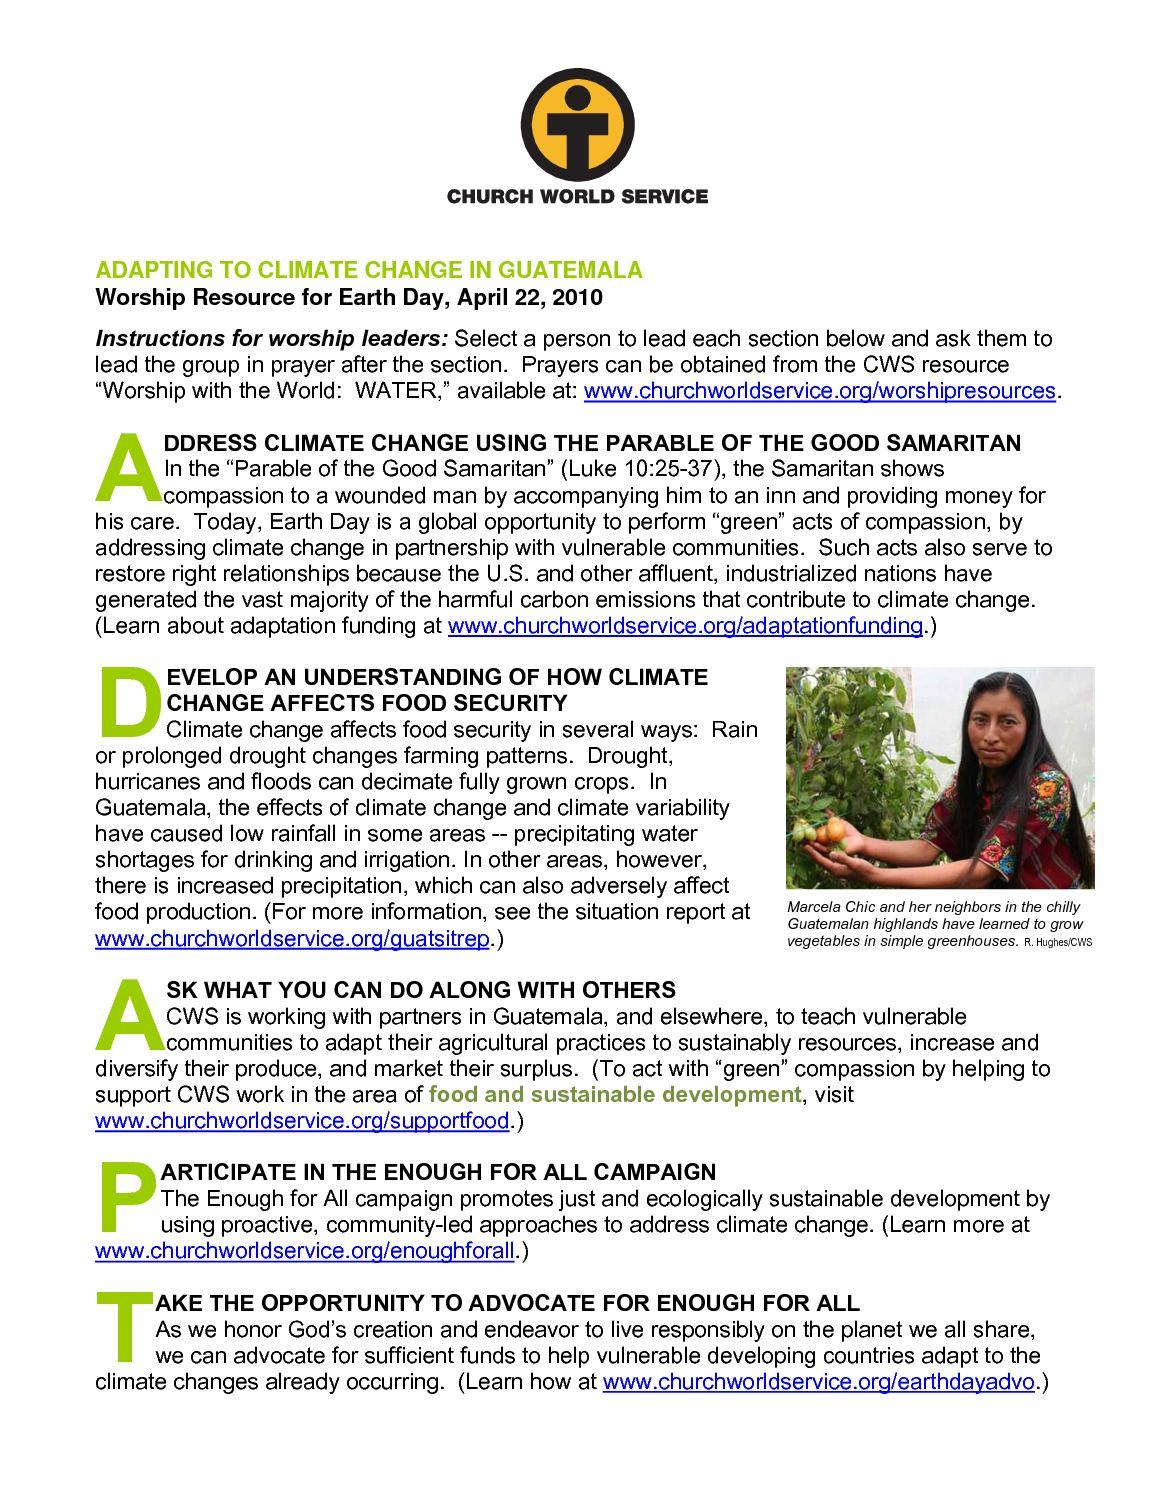 Calaméo - Adapting to Climate Change in Guatemala - Church